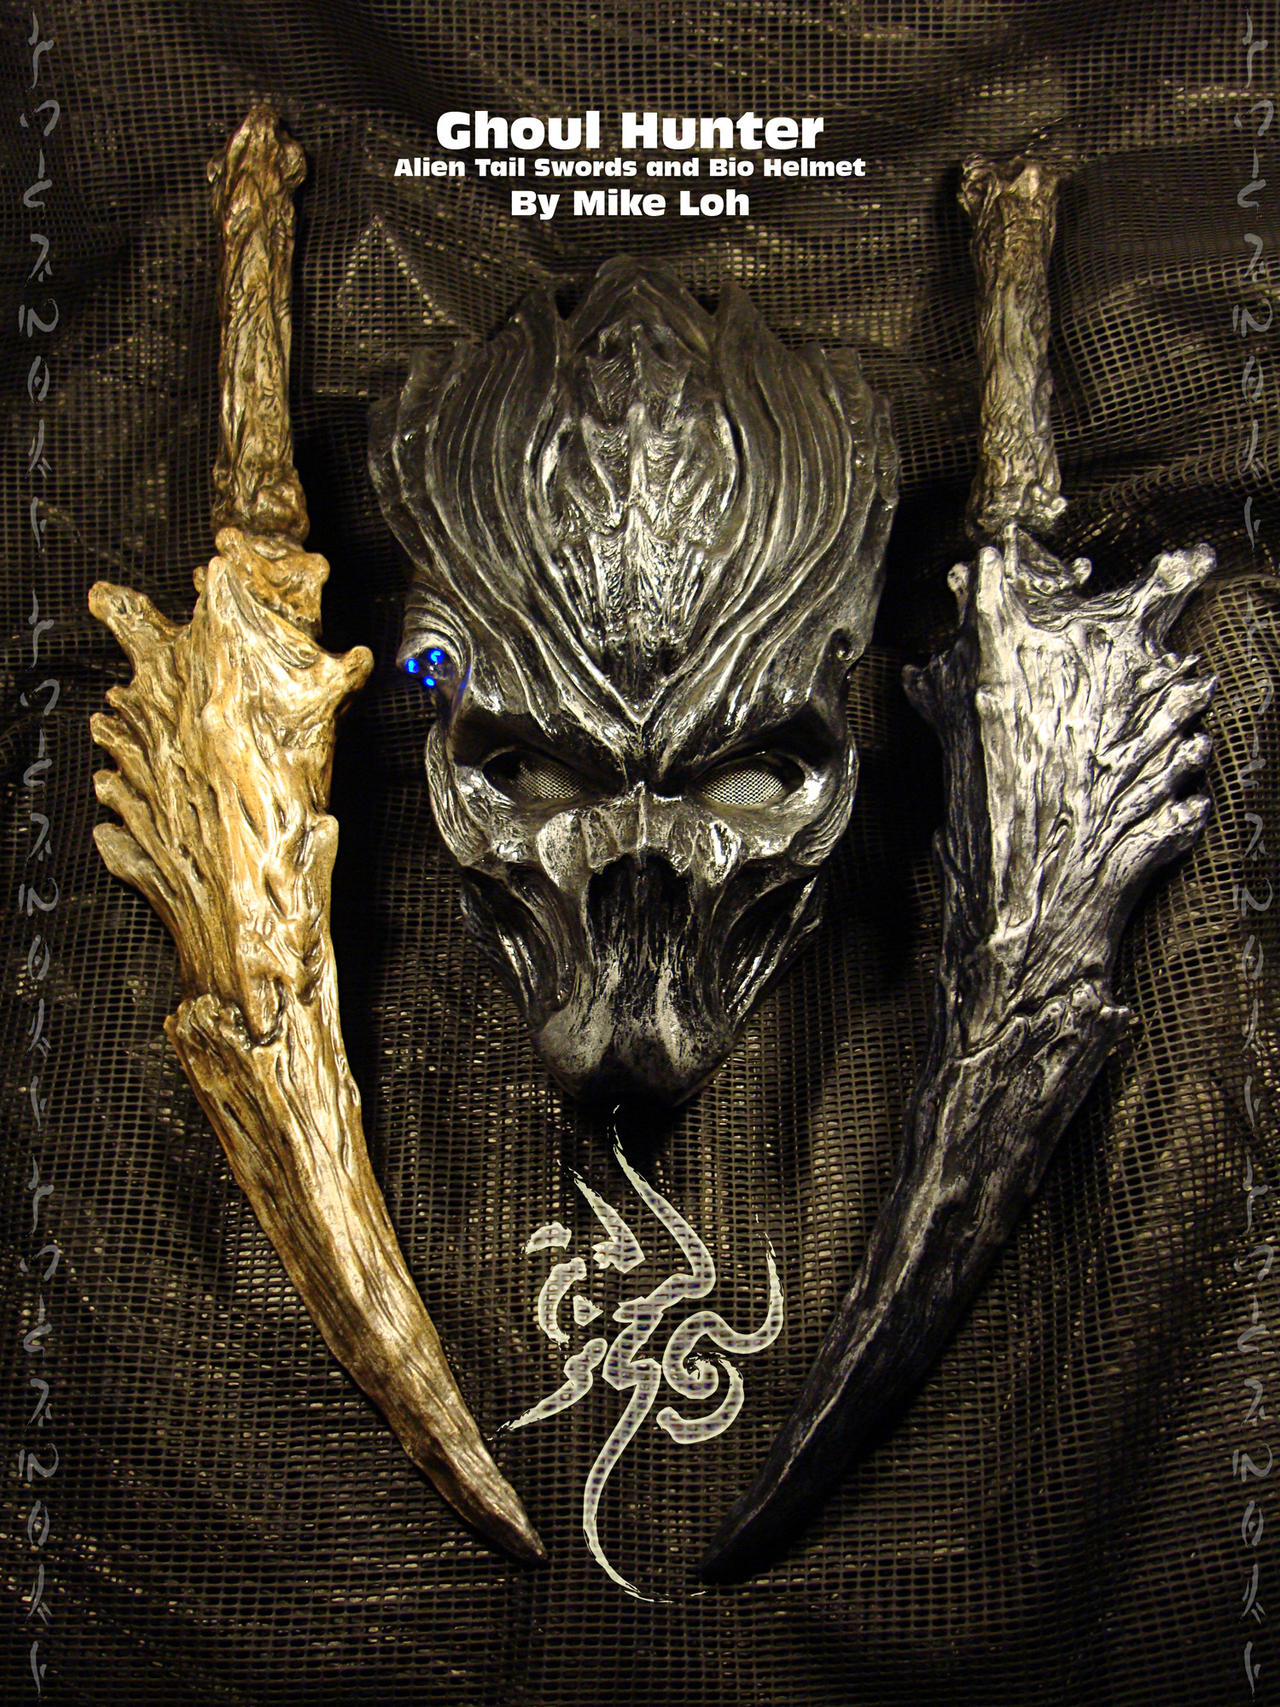 Ghoul hunter sword of balance by uratz studios on deviantart - Uratz studios ...